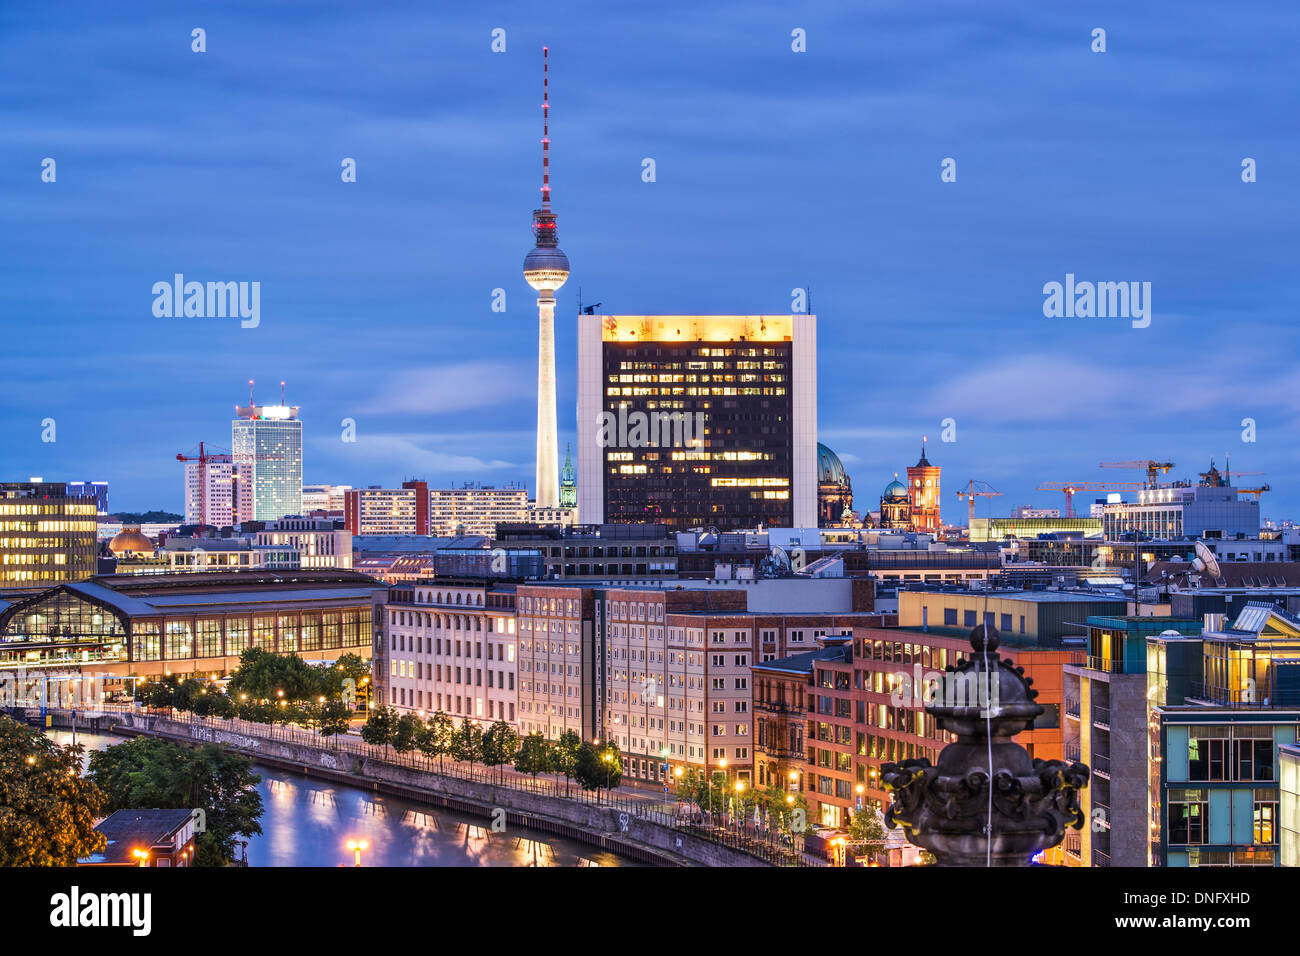 Cityscape of Berlin, Germany. Stock Photo